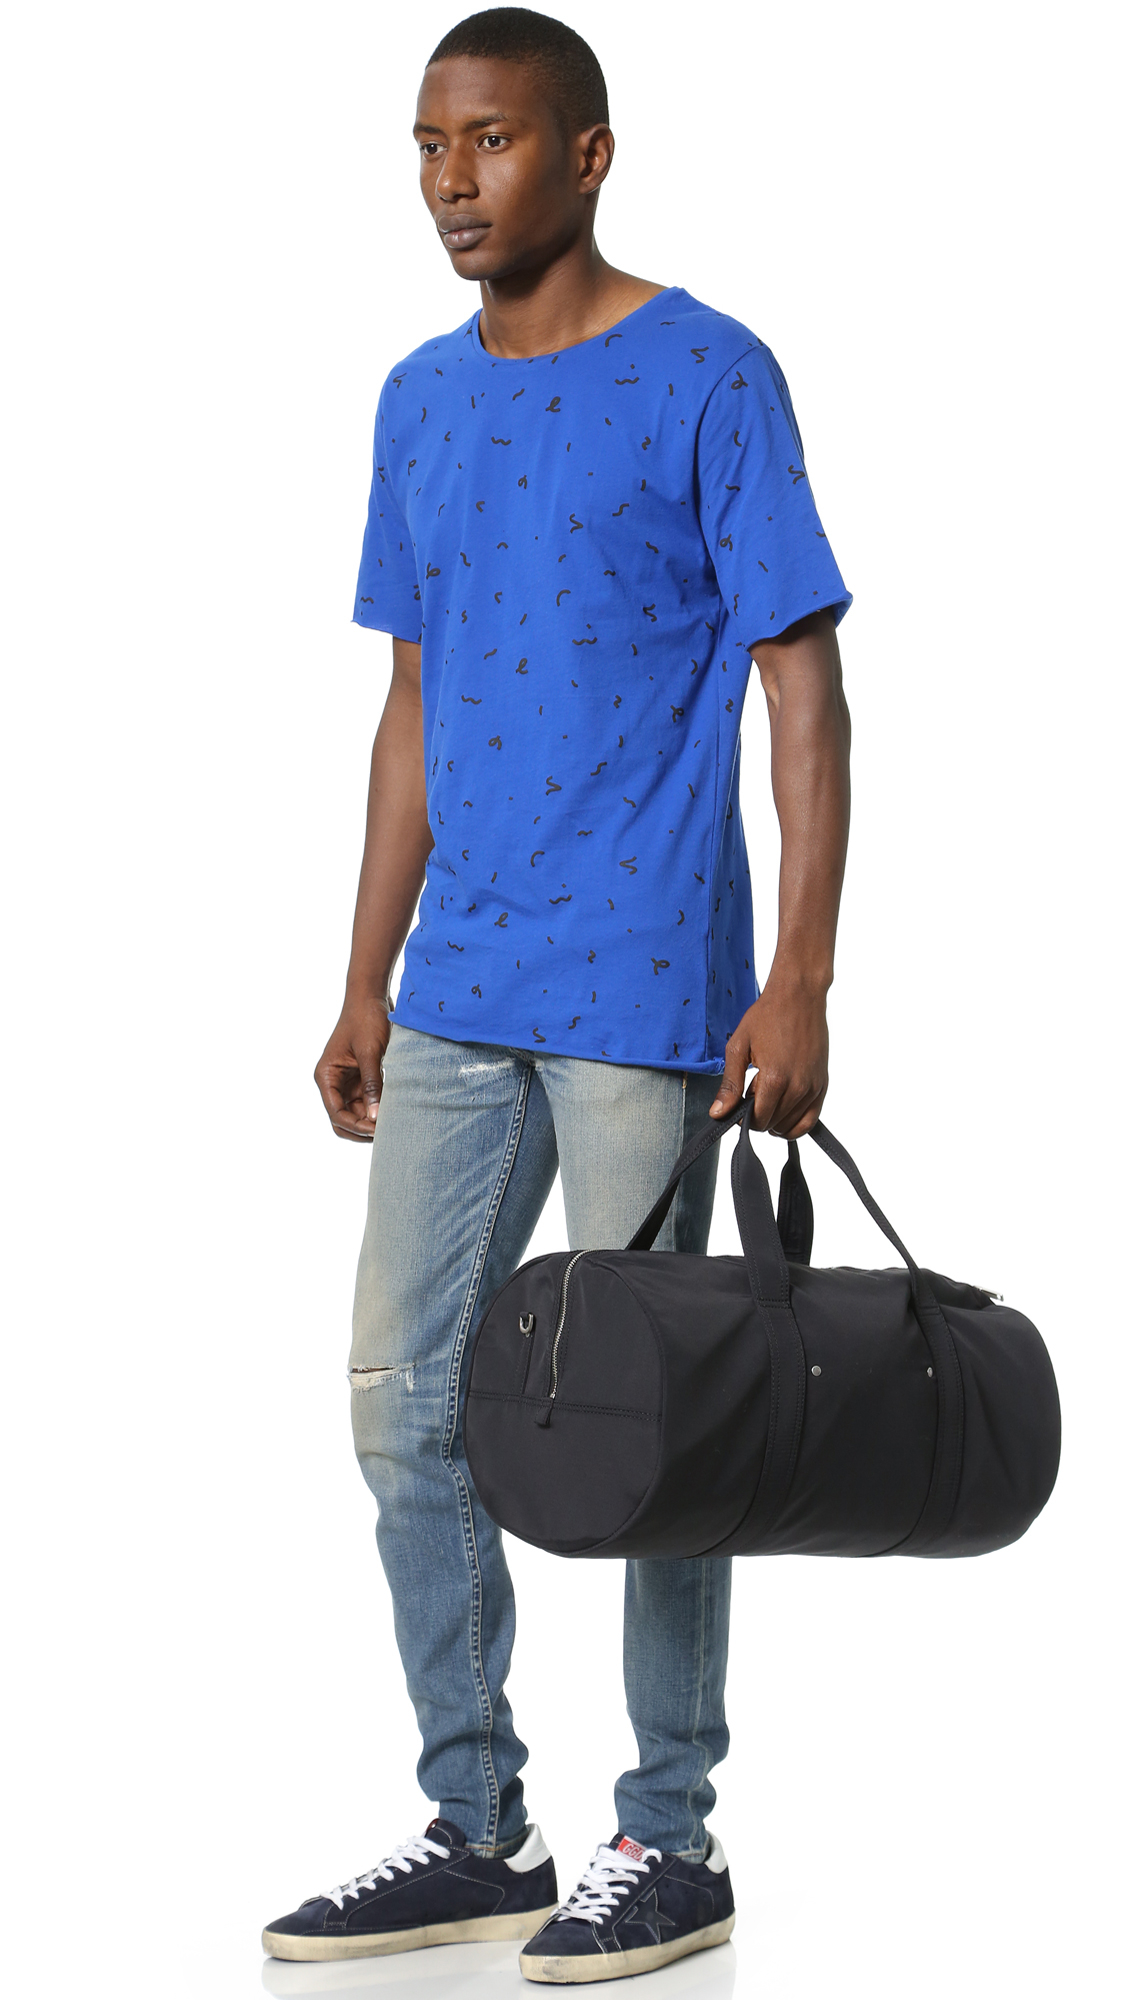 7b56c05cc0 Lyst - Jack Spade Tech Nylon Gym Duffel Bag in Black for Men